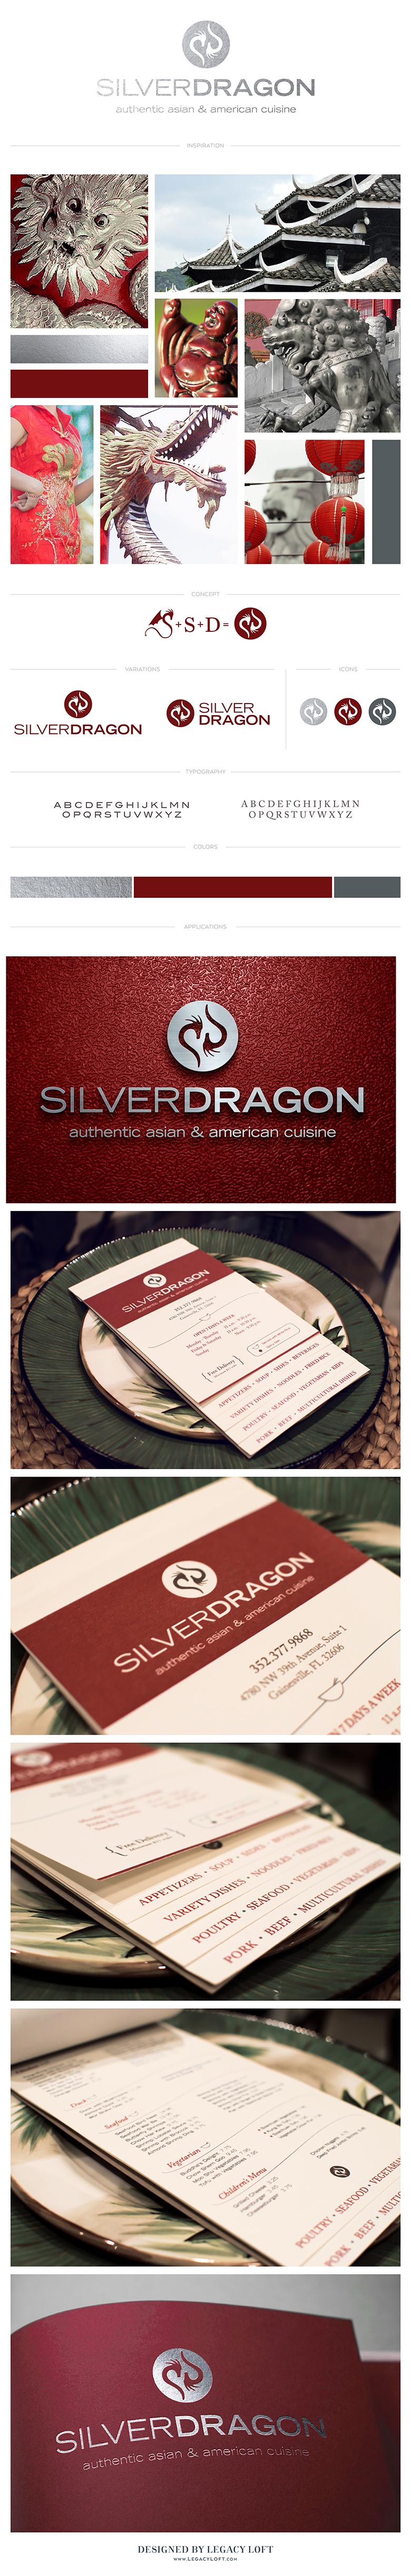 silver-dragon-restaurant-branding-graphic-design-brand-board